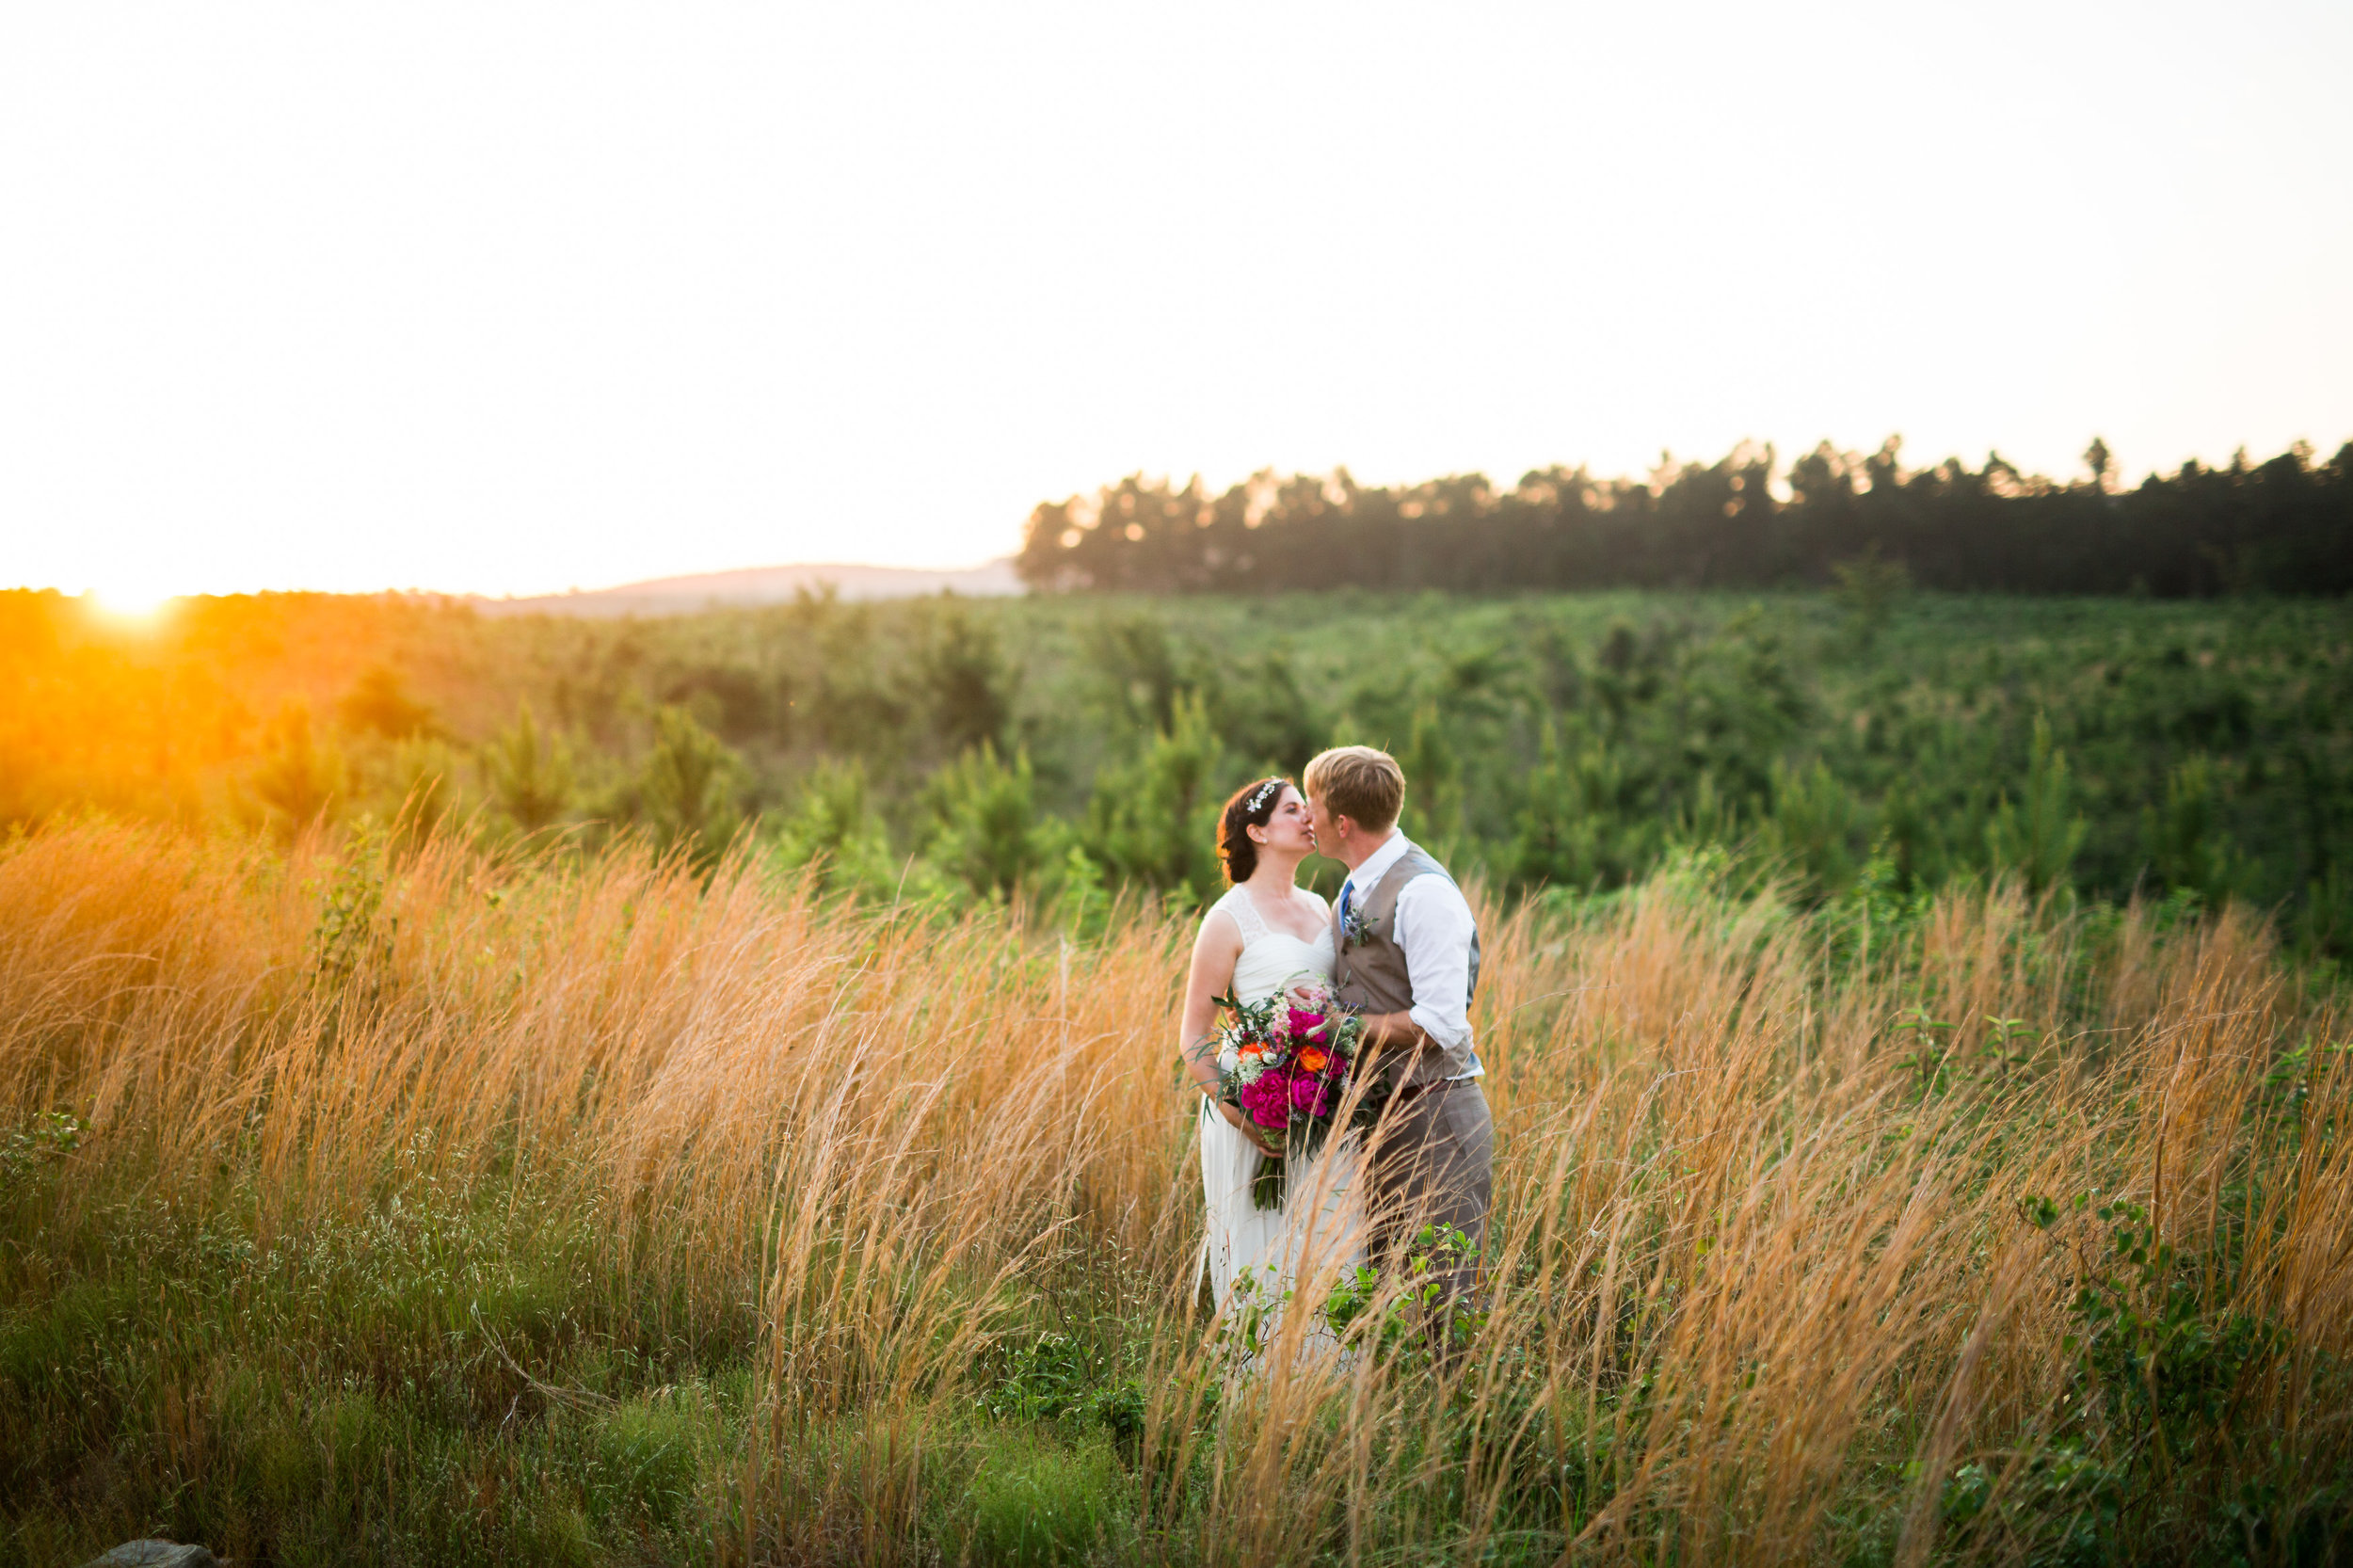 oklahoma wedding southeastern oklahoma saris colors diy nature norman wedding photography beavers bend mccurtain county decor field sunset